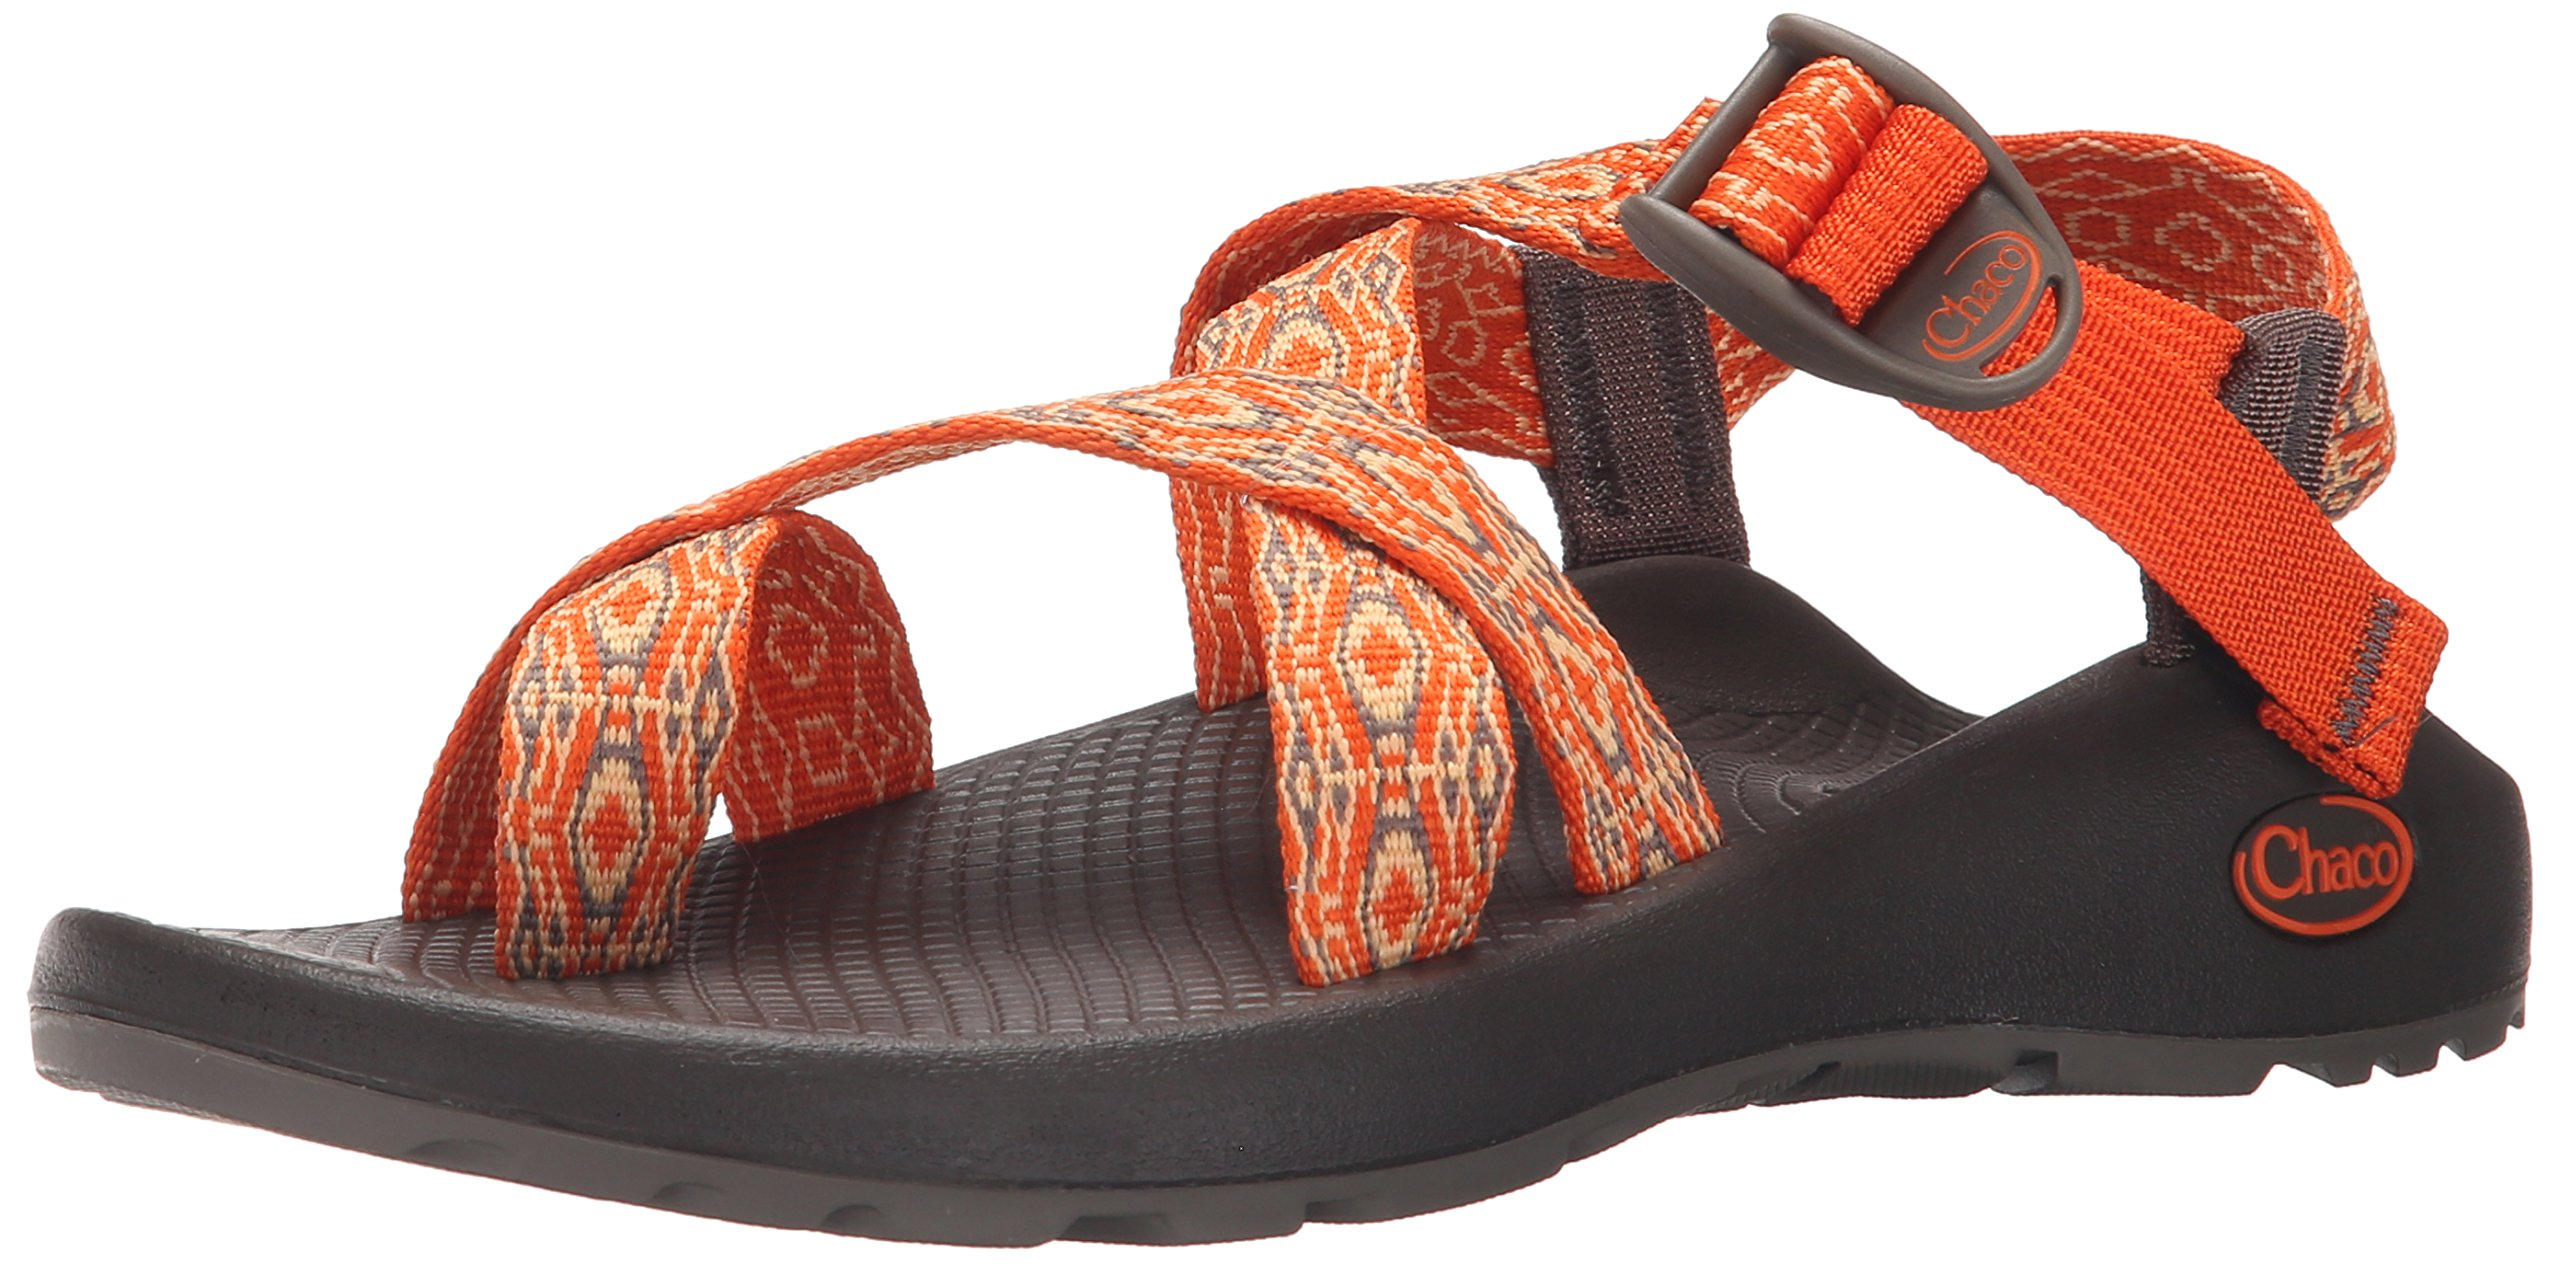 Chaco Women's Z2 Classic Sport Sandal, Native Apricot, 9 M US